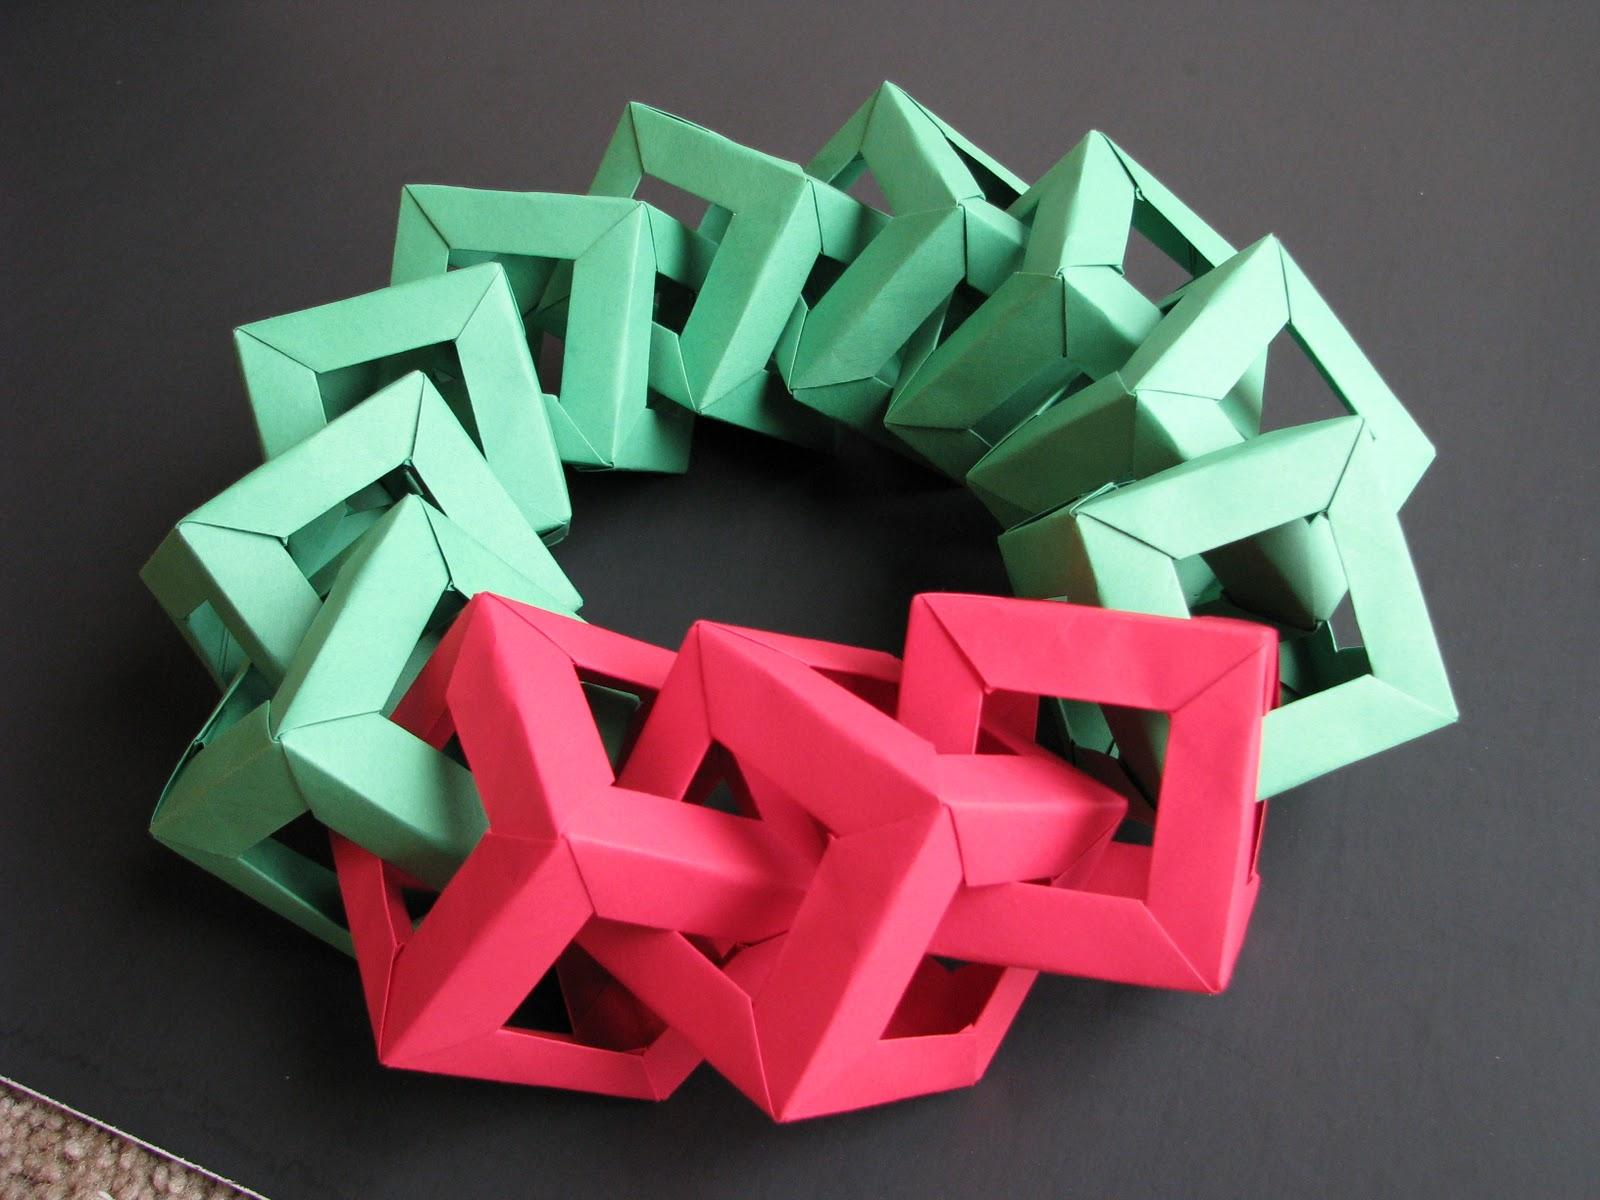 Stephen s origami origami christmas decorations origami wreath